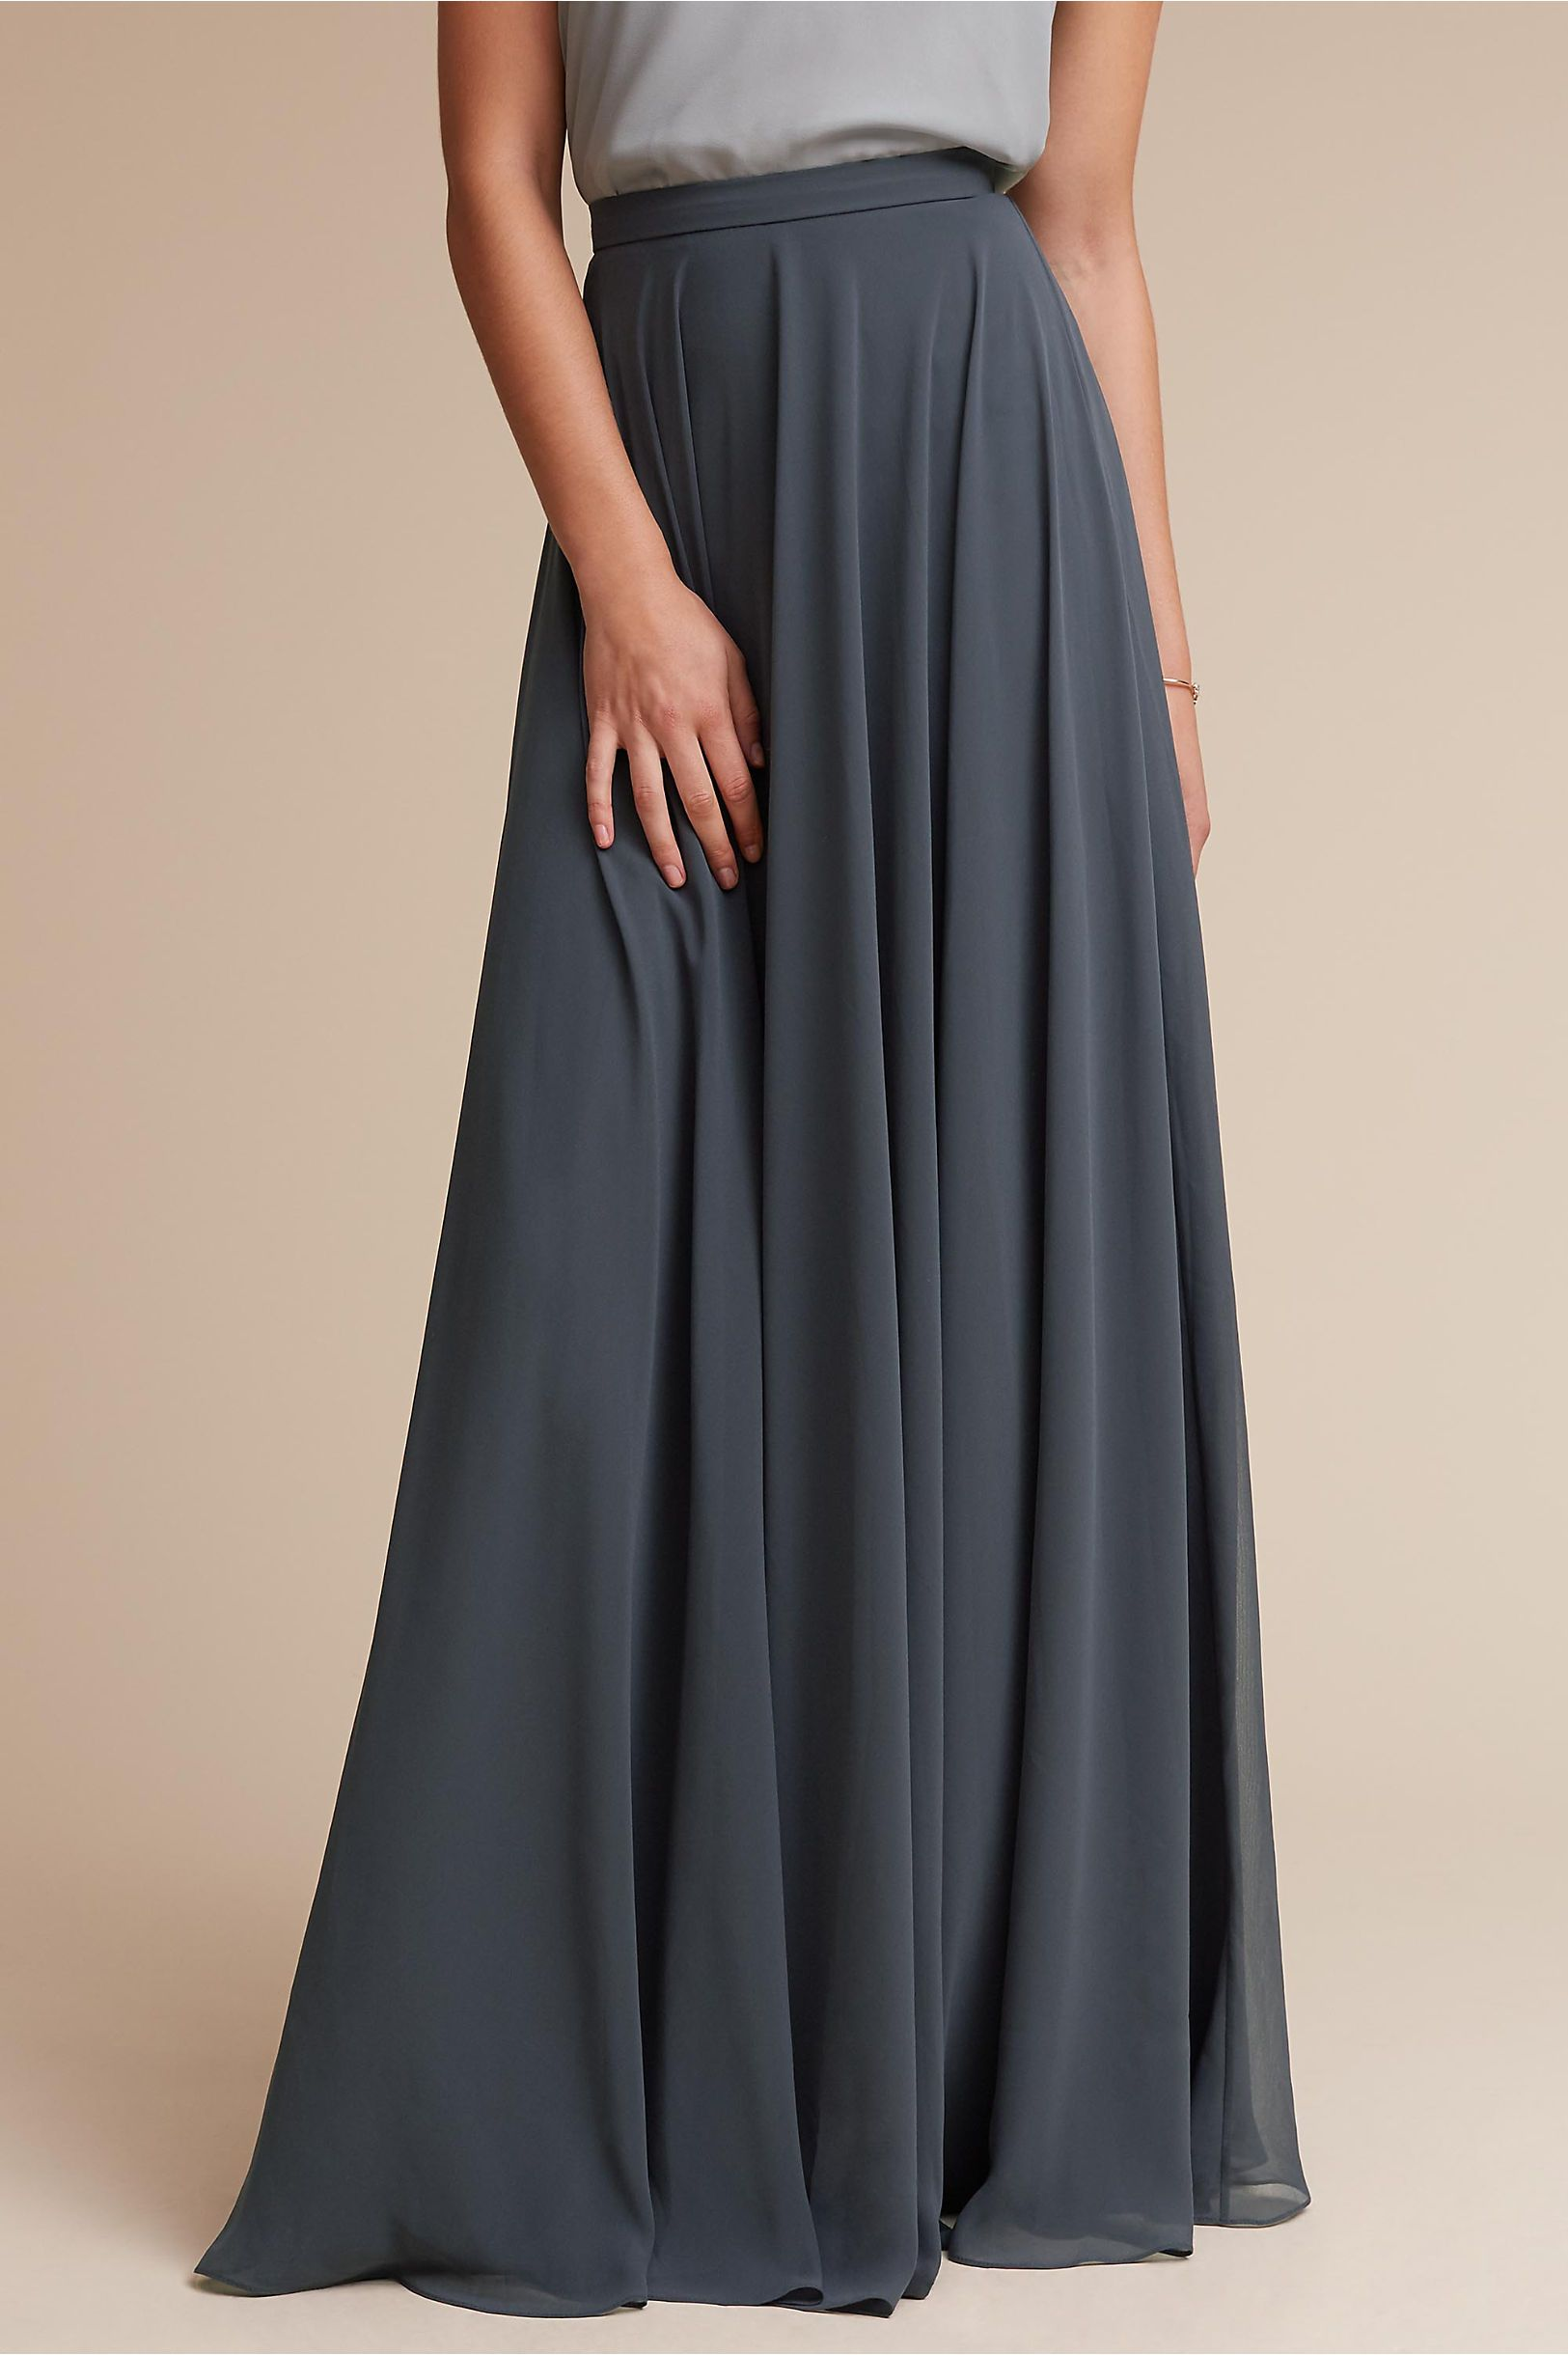 58dc9819fc Hampton Skirt   Products   Fashion, Bridesmaid separates a ...